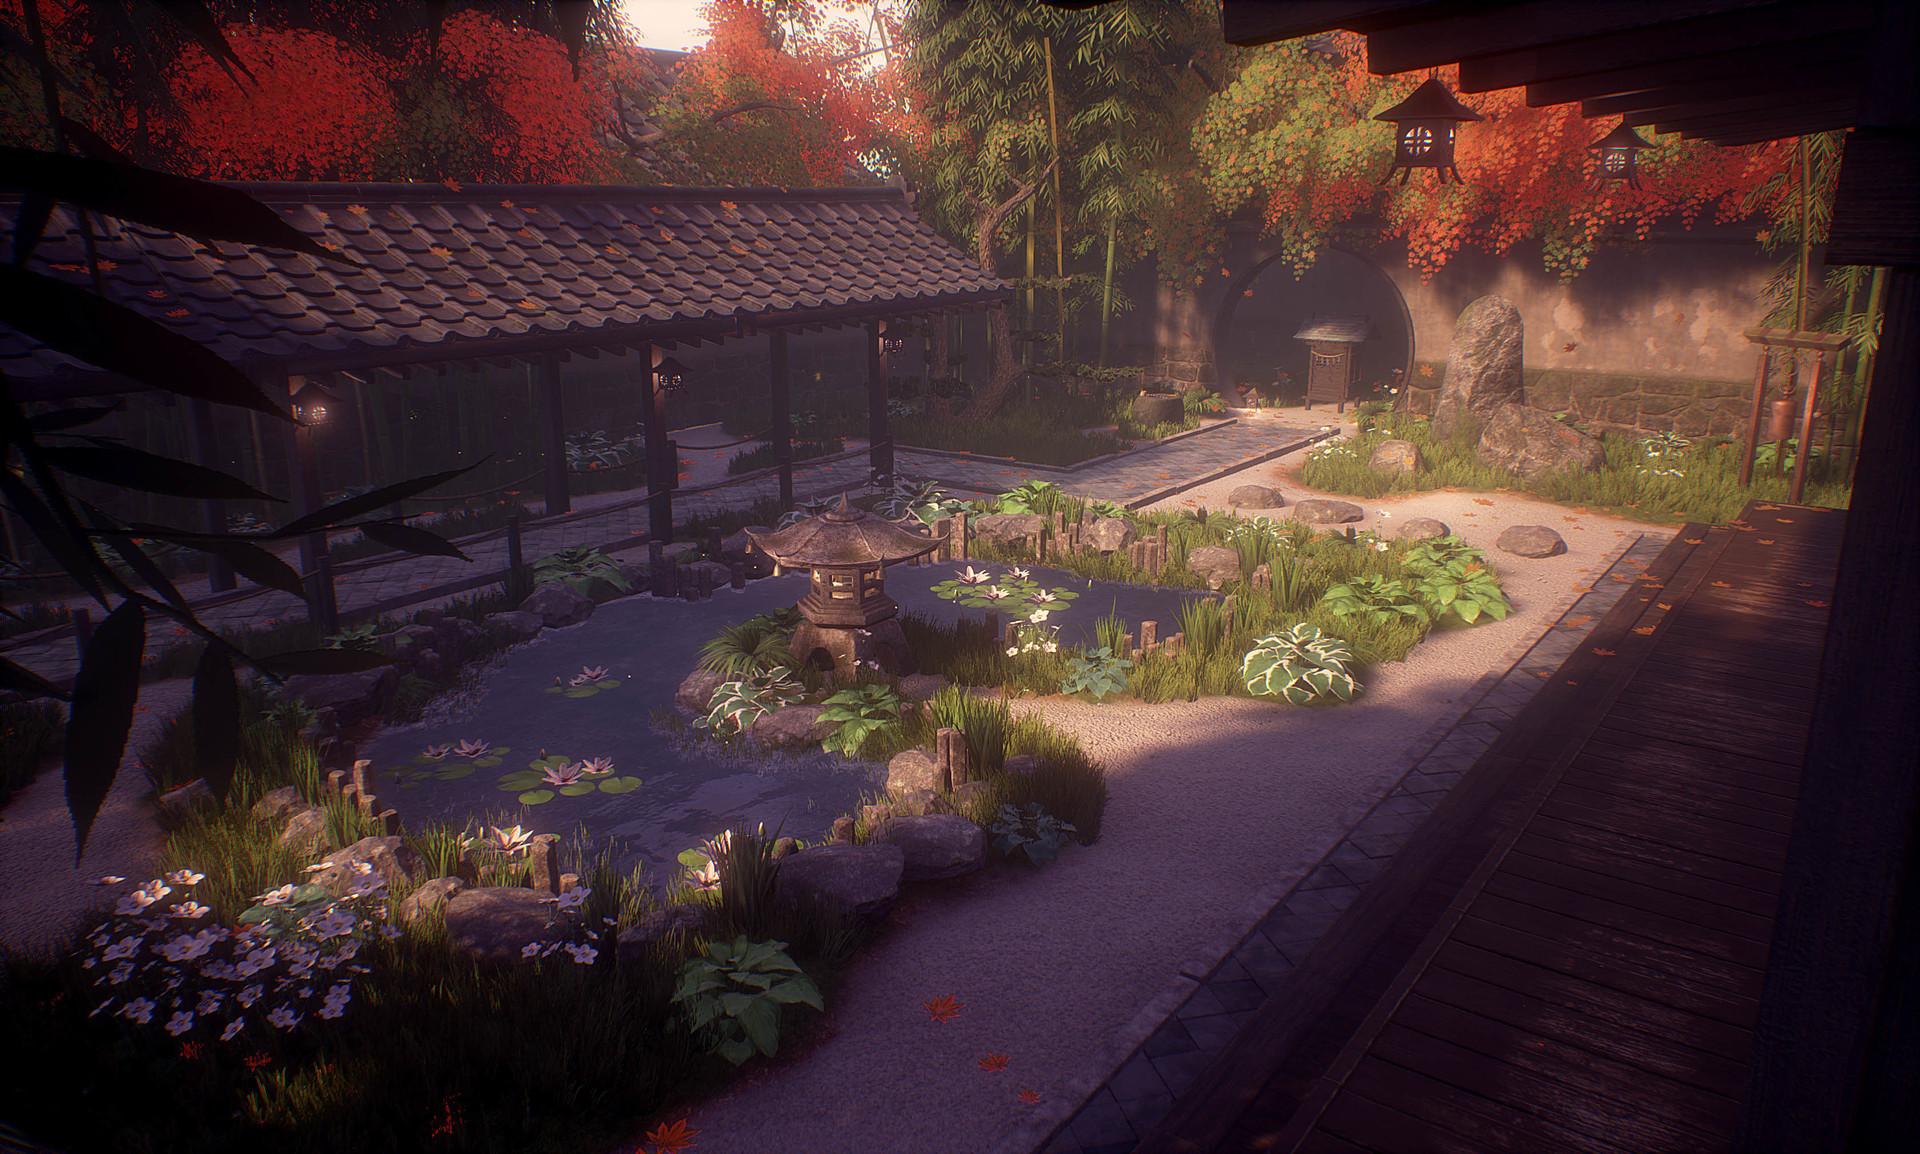 Japanese Garden At Night artstation - japanese garden environment [ue4], sophie holt